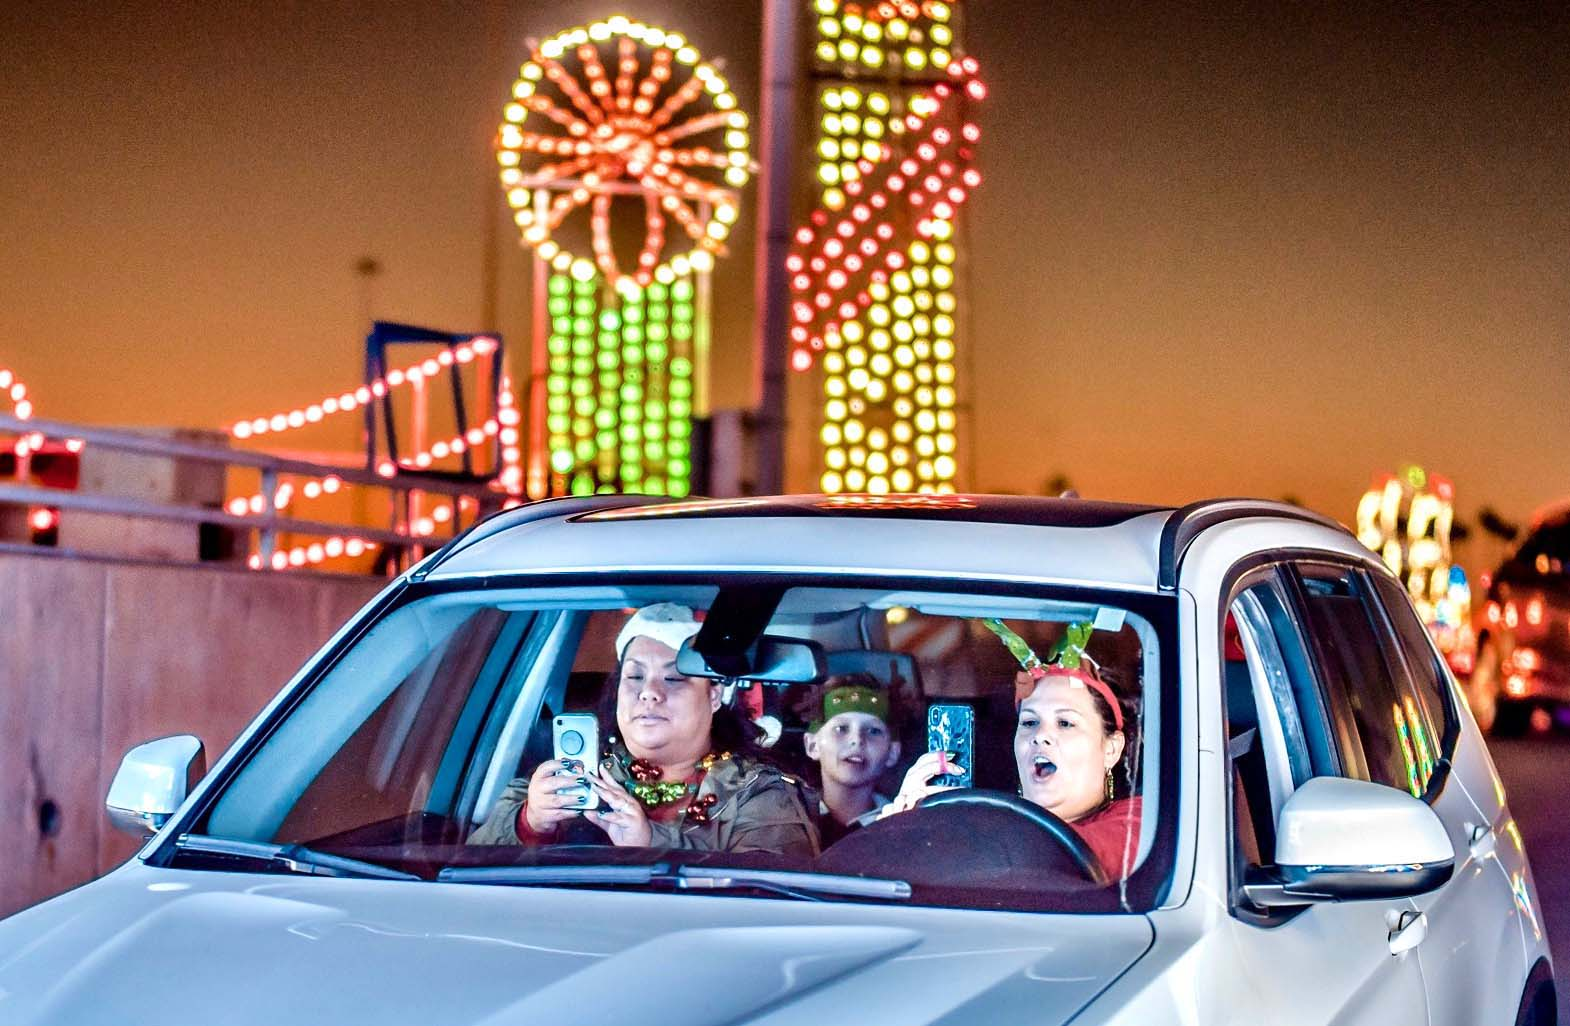 Del Mar Holidays light show